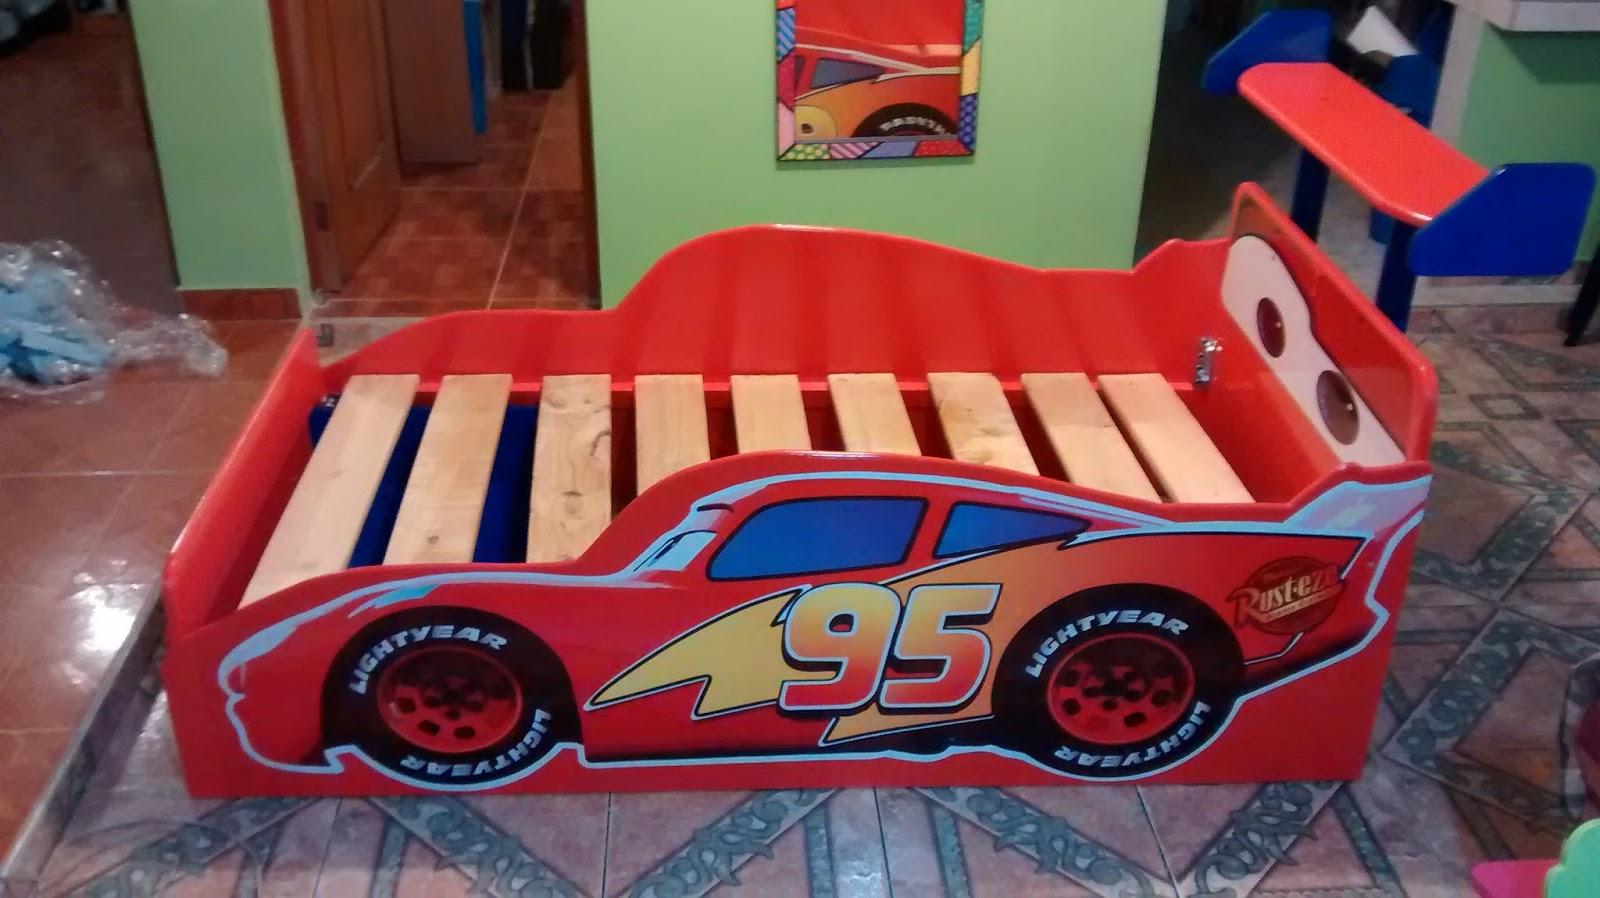 Galeria arte y dise o madekids cama infantil cars rayo - Cama infantil cars ...